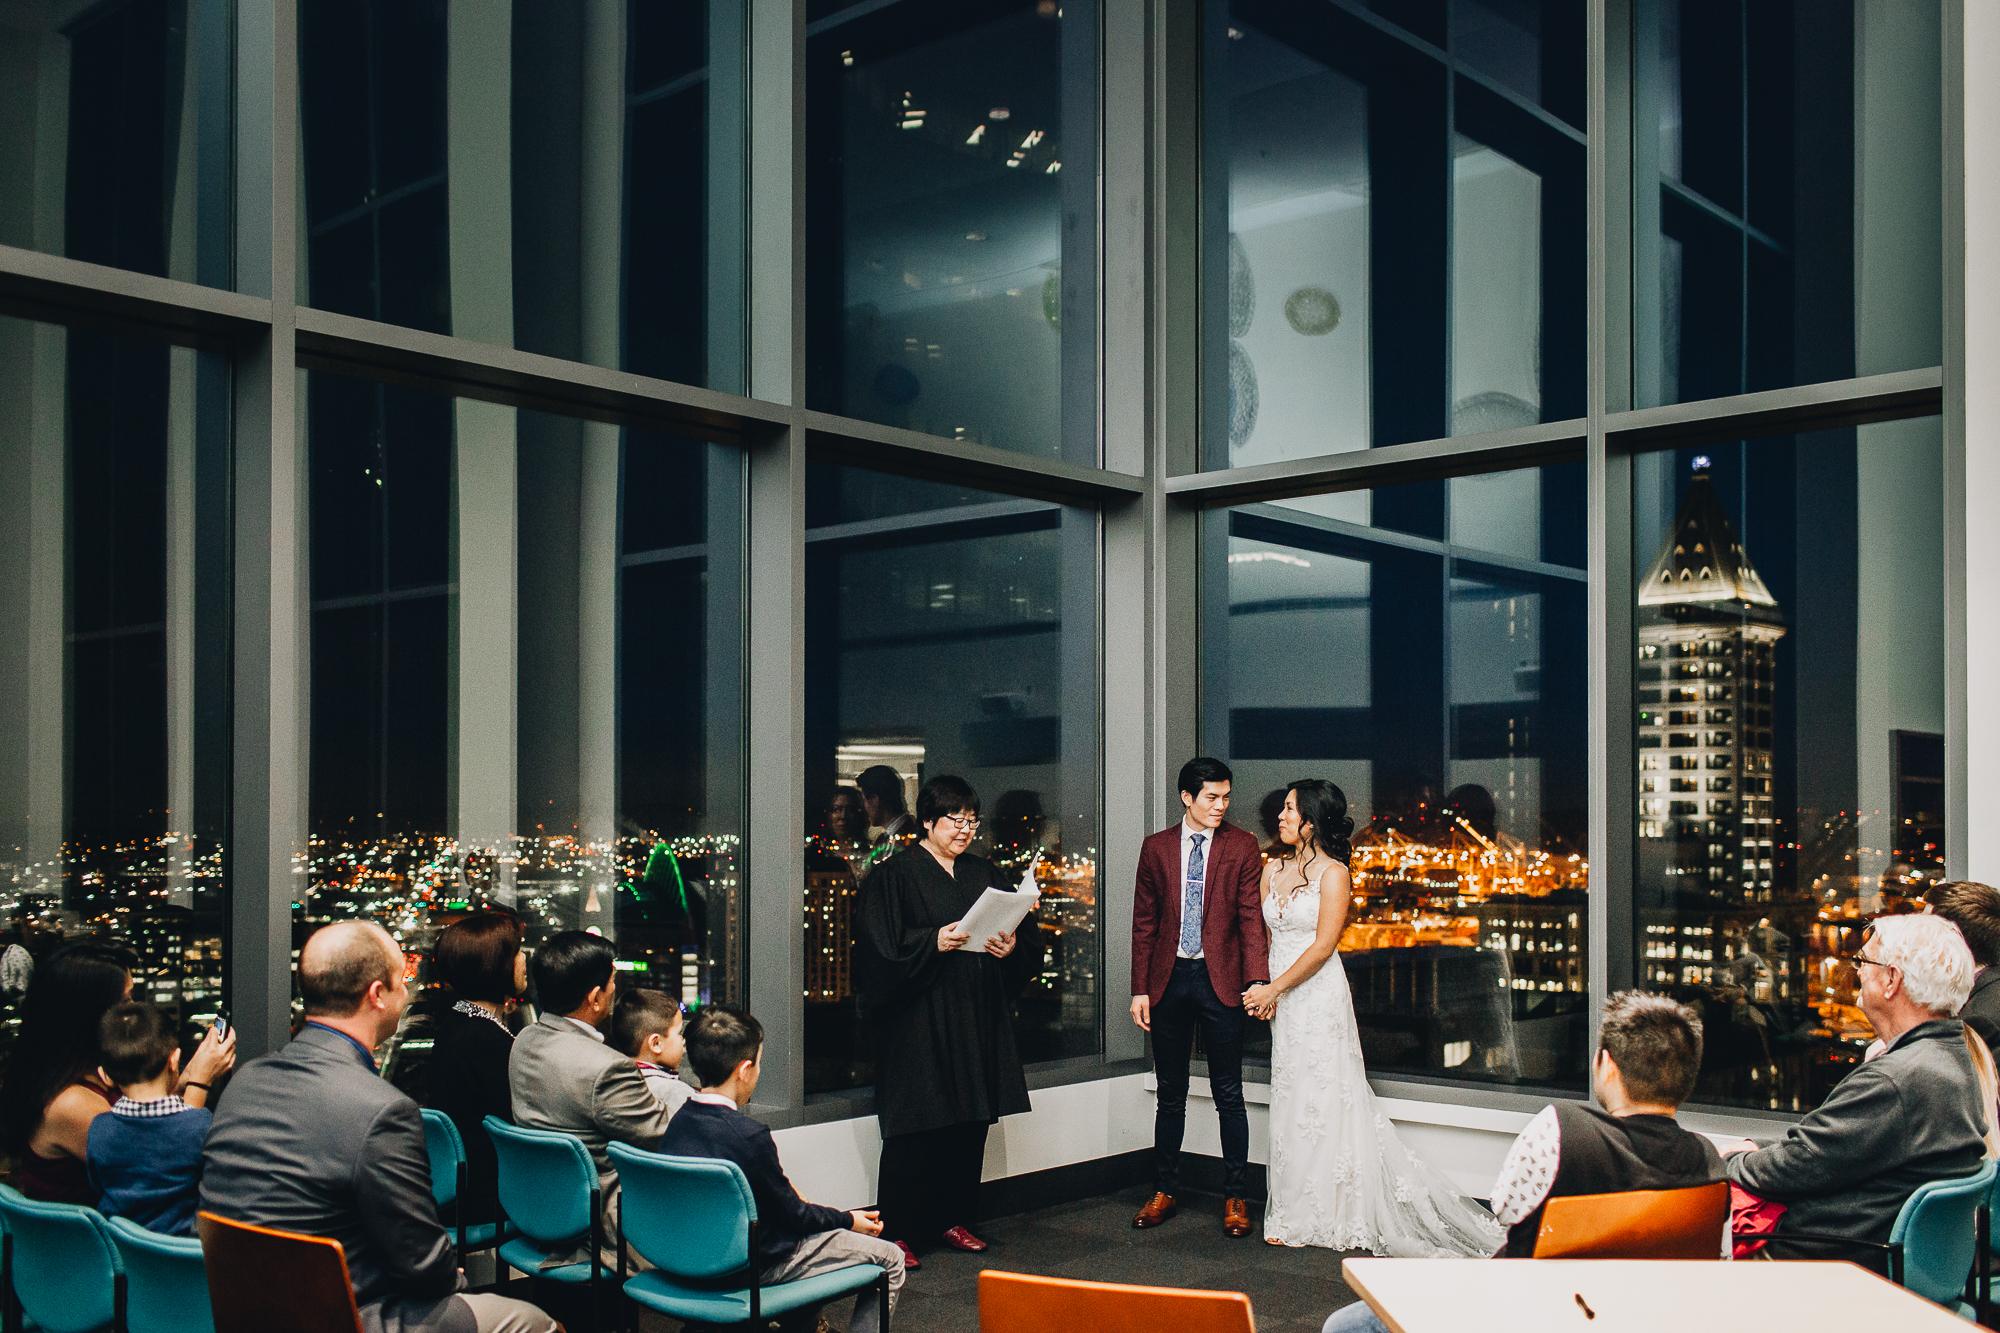 Seattle courthouse wedding photos kristawelch57.jpg